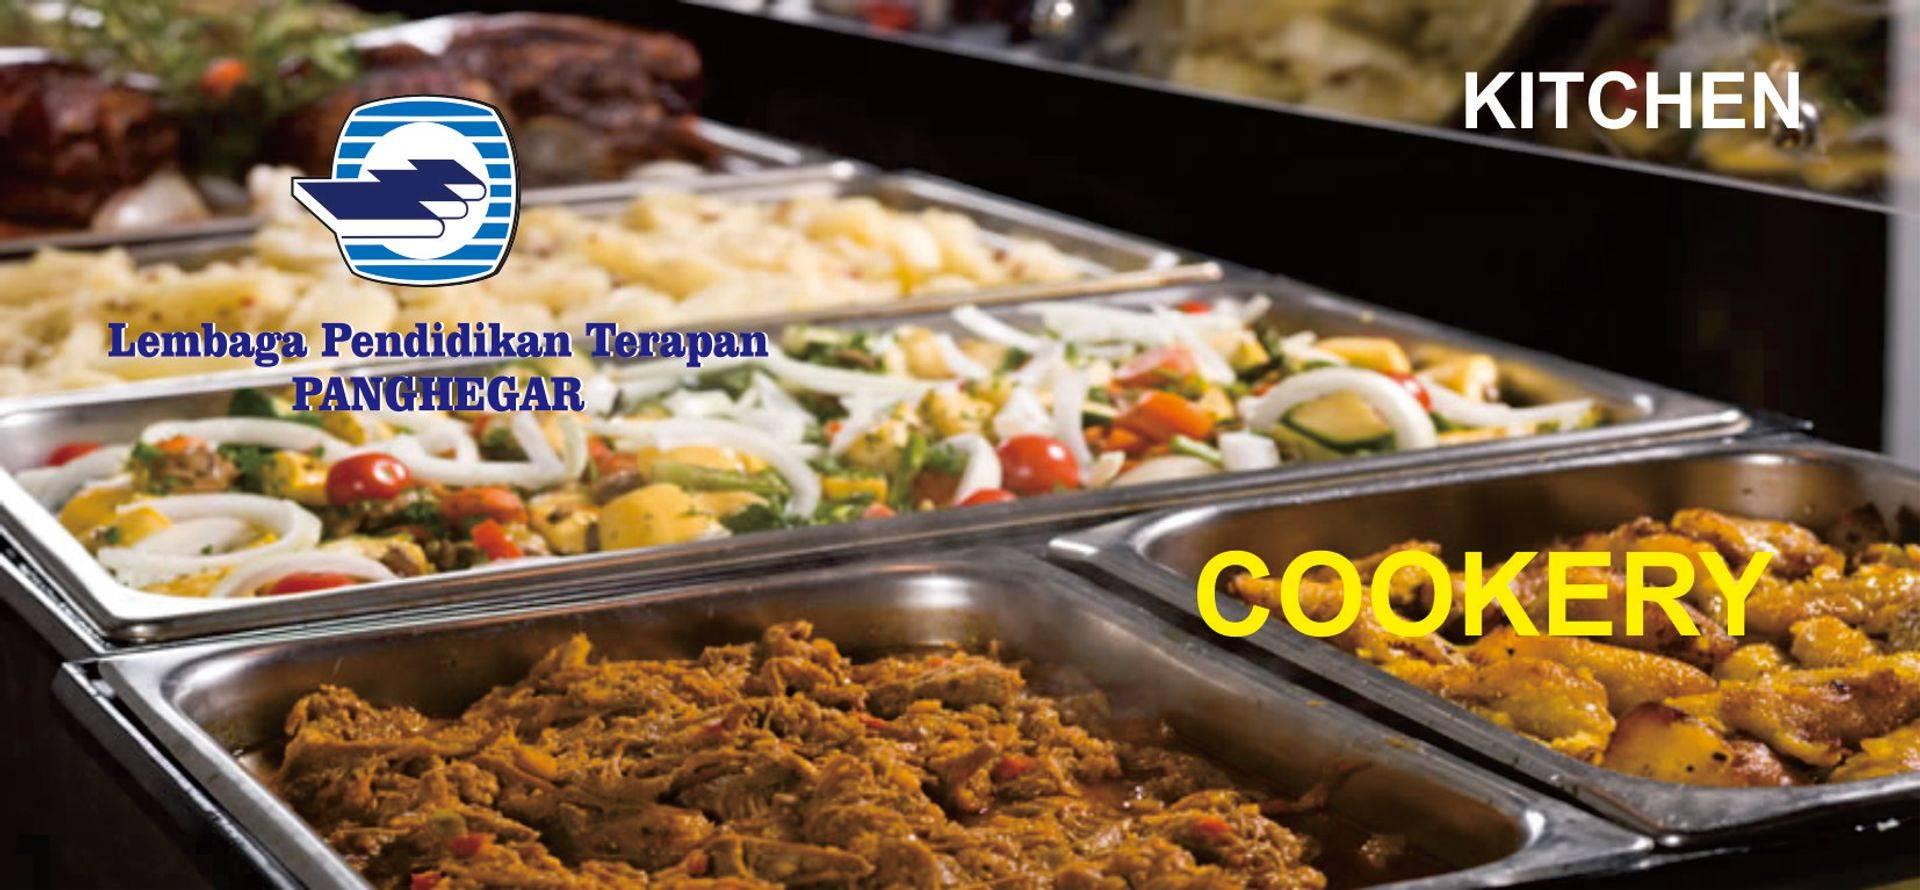 Kitchen - Cookery